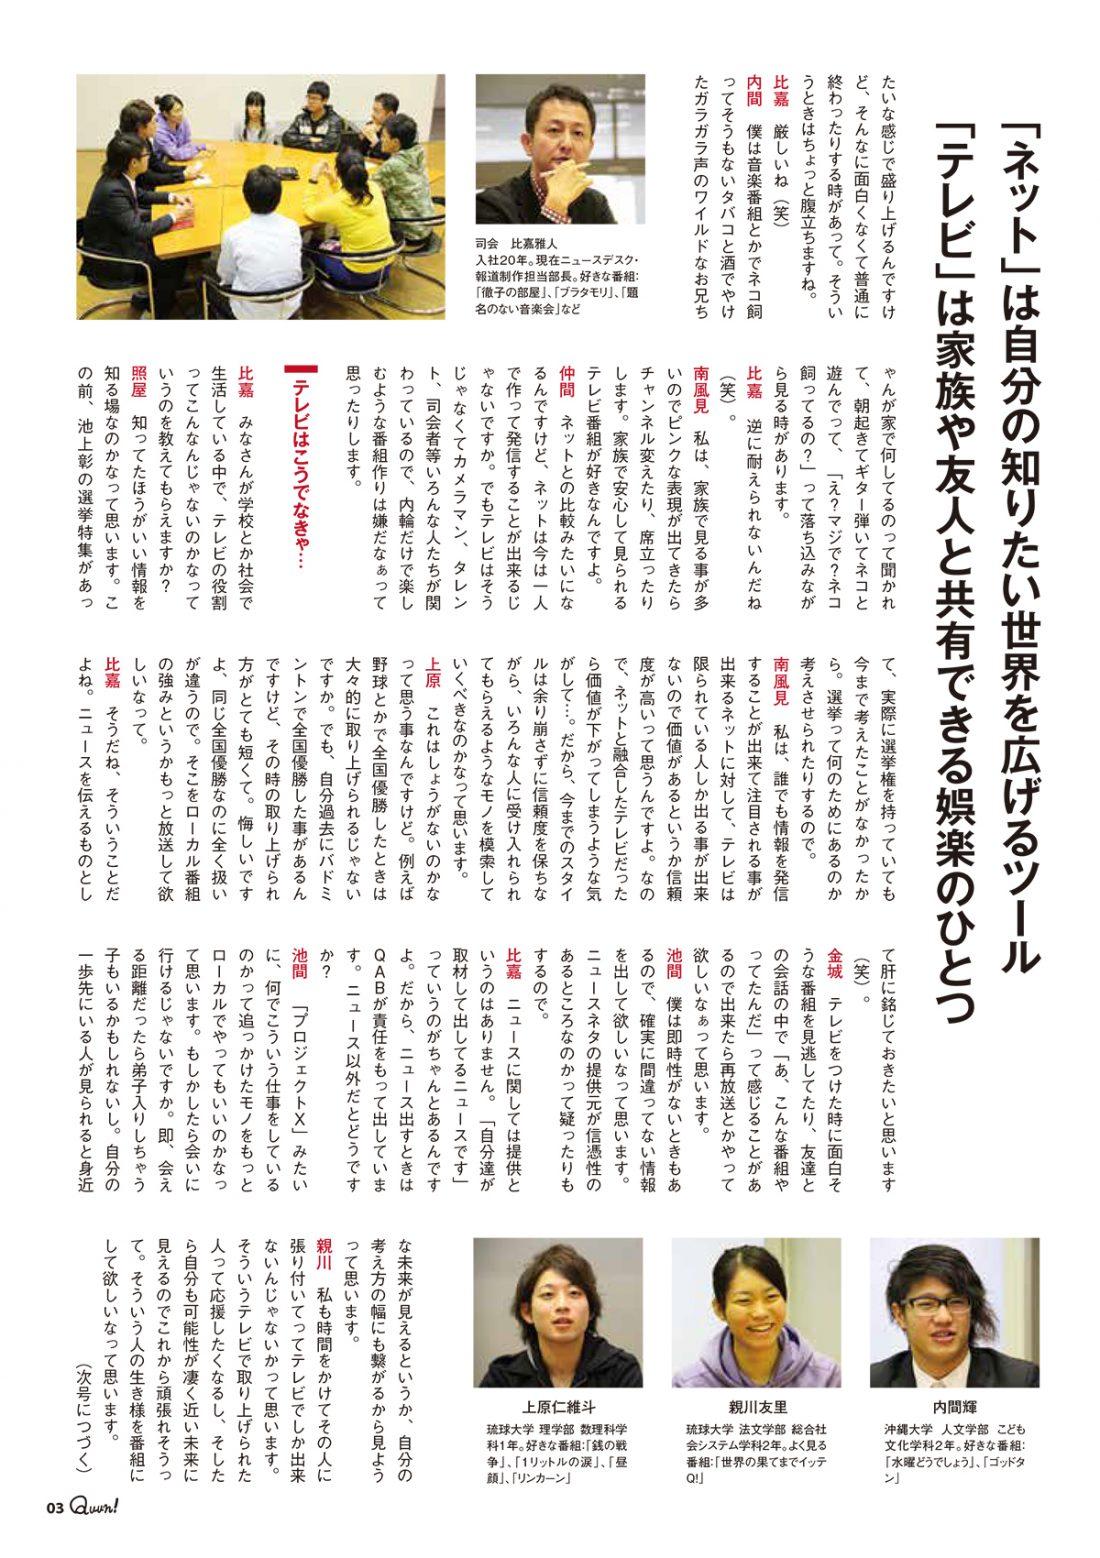 https://www.qab.co.jp/qgoro/wp-content/uploads/quun_0305-1100x1558.jpg